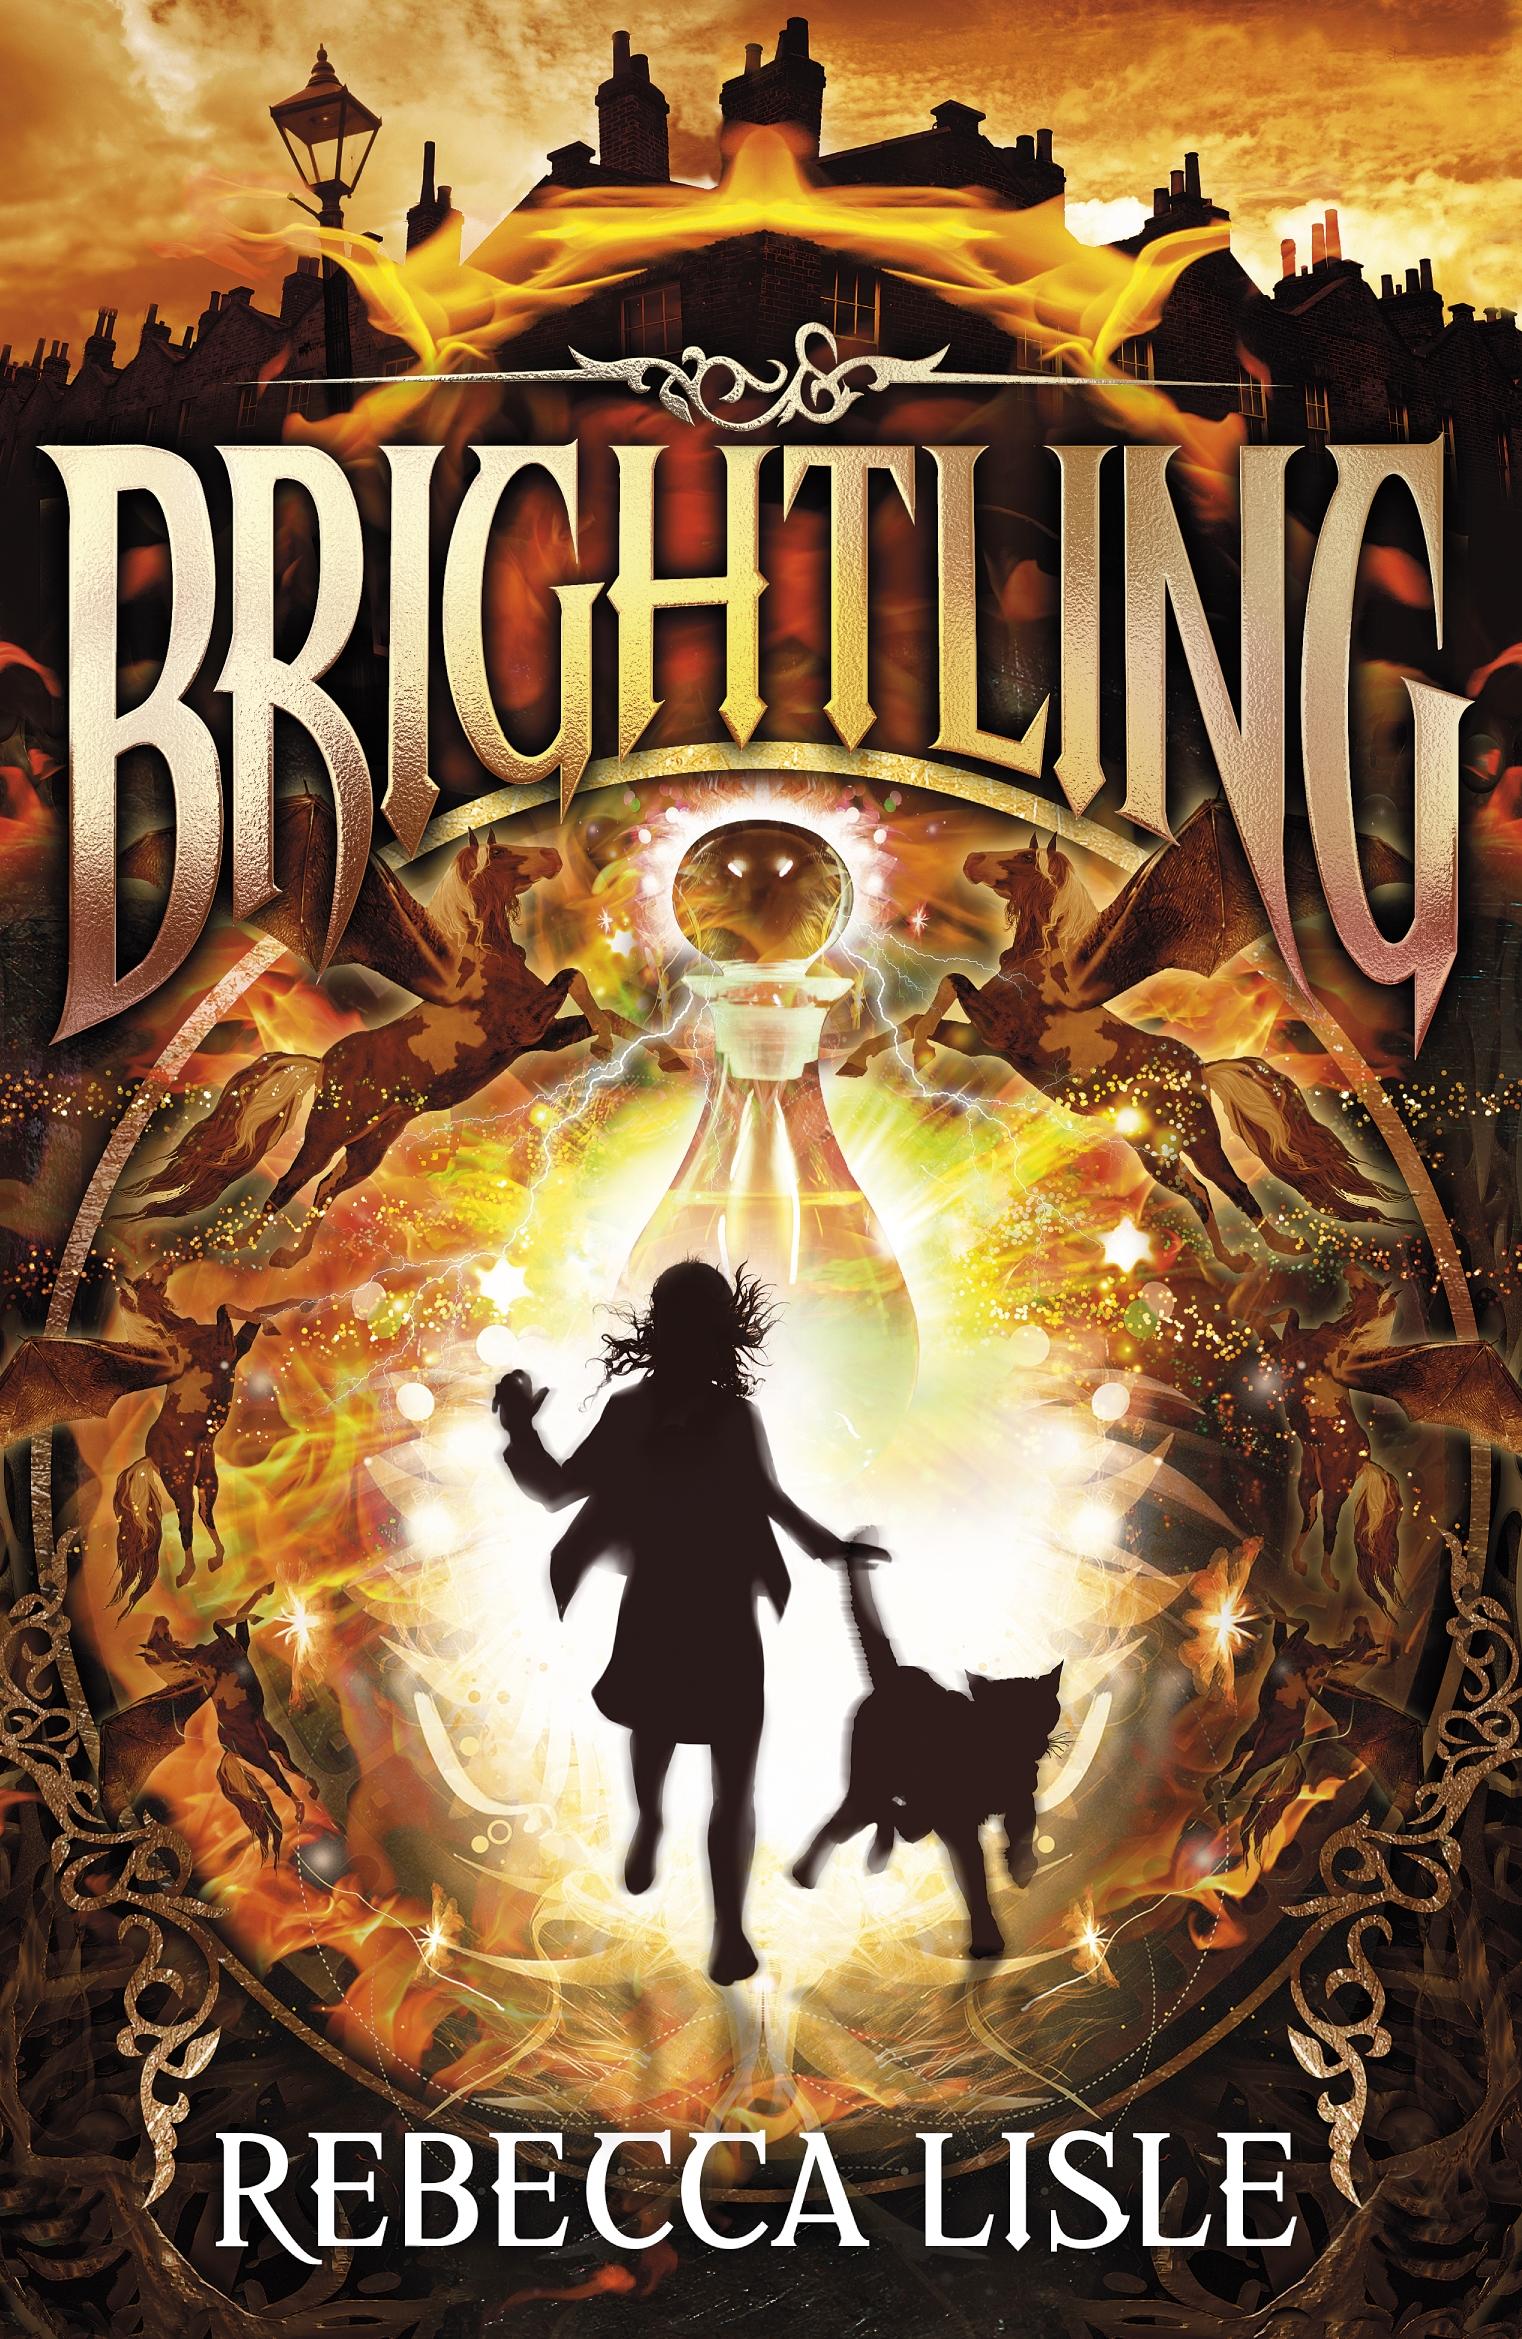 Brightling by Rebecca Lisle